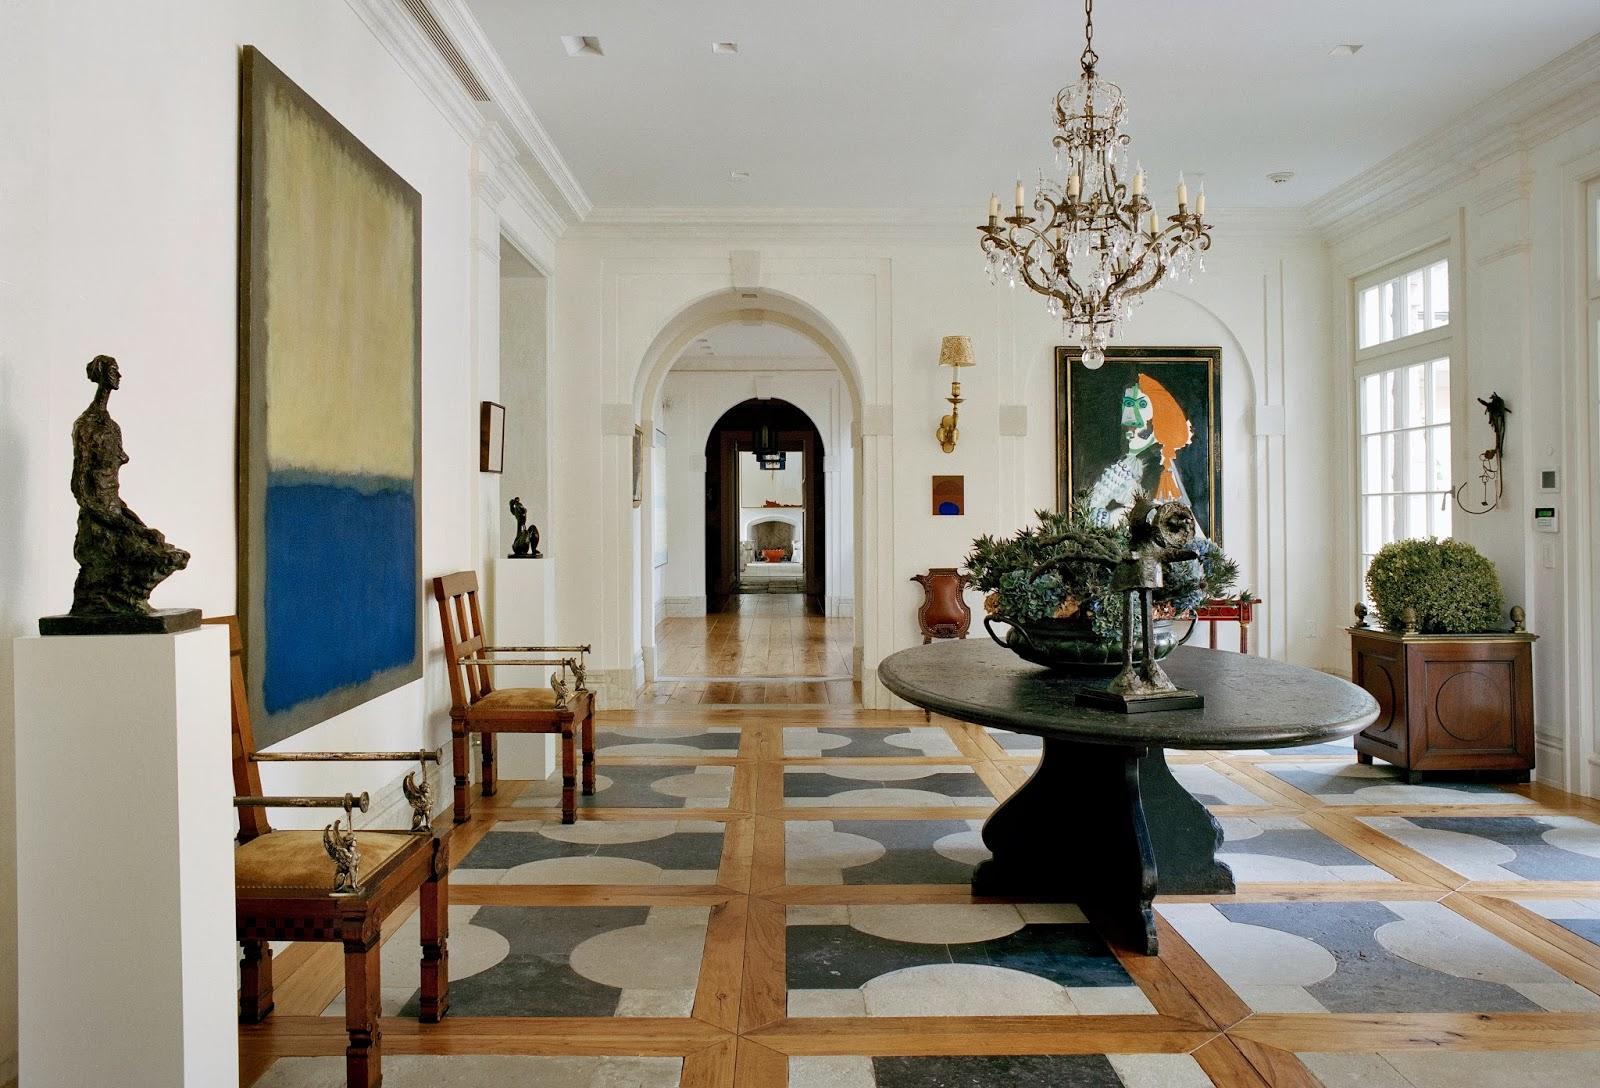 PRESIDIO HEIGHTS - washington street - $15,000,000